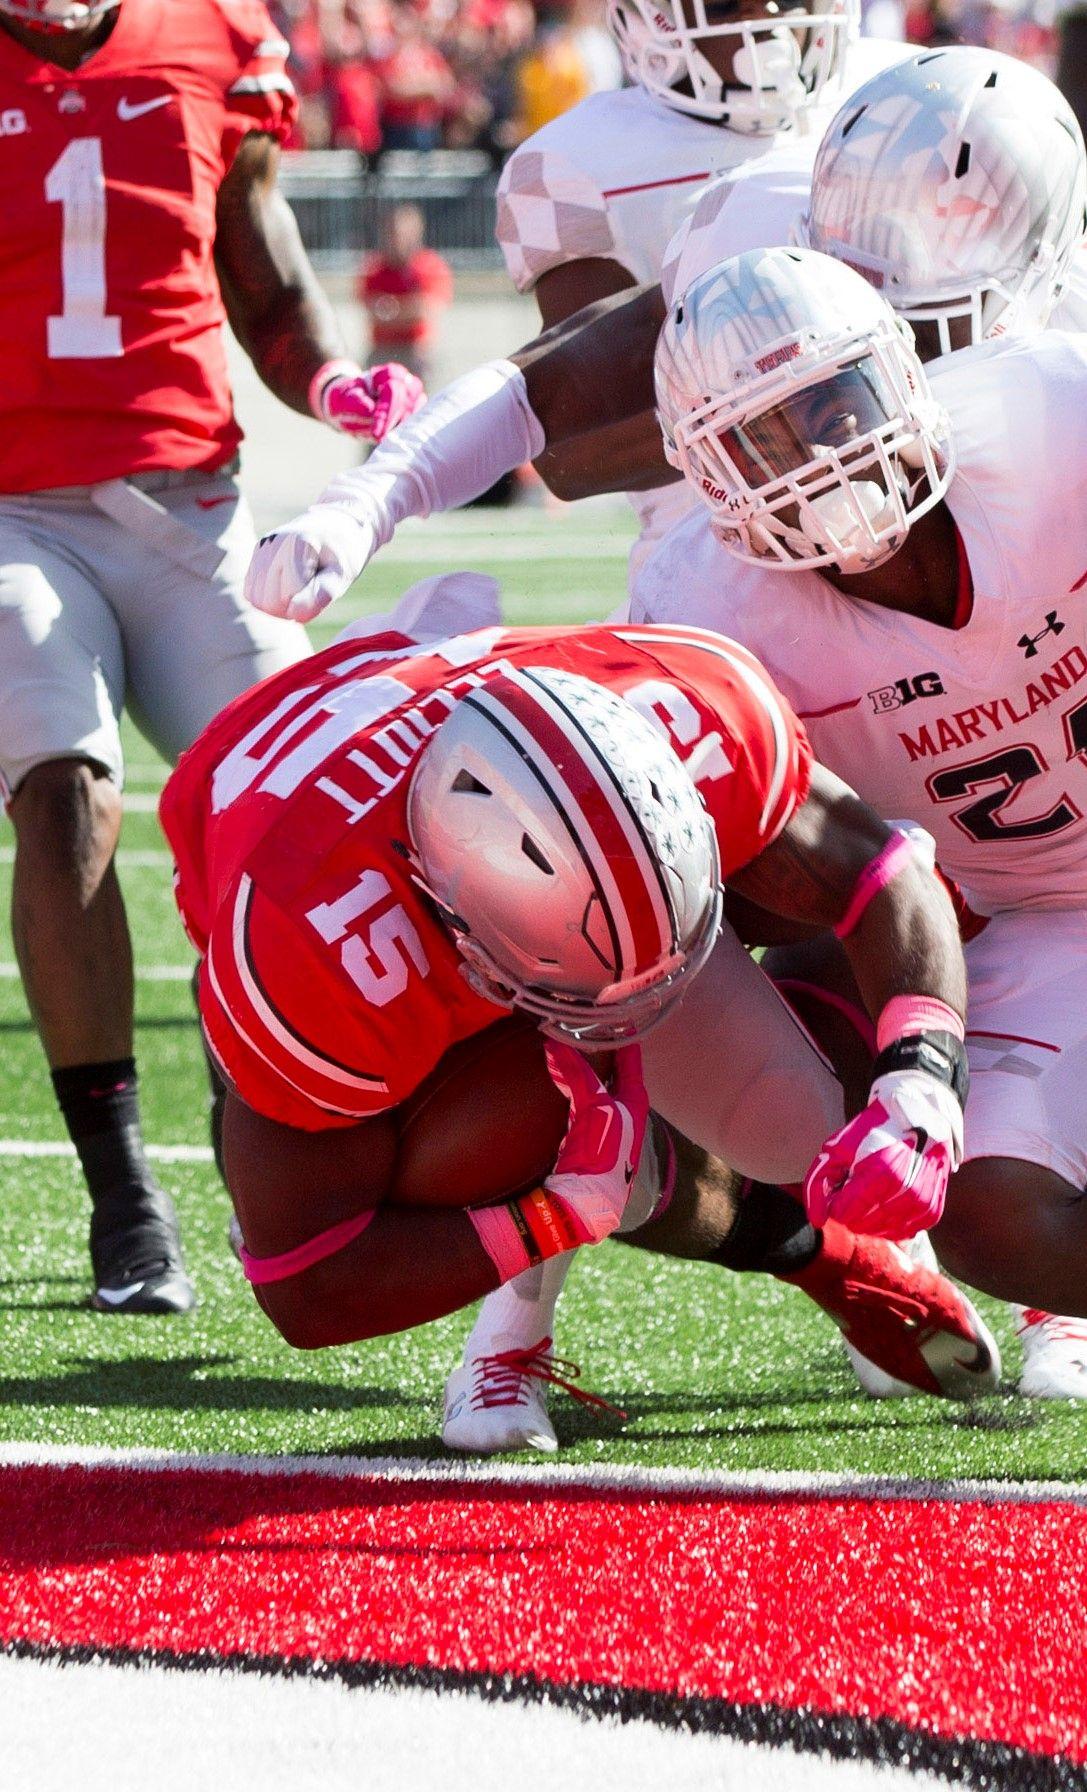 Ohio State's Ezekiel Elliott explains why he rolls up his